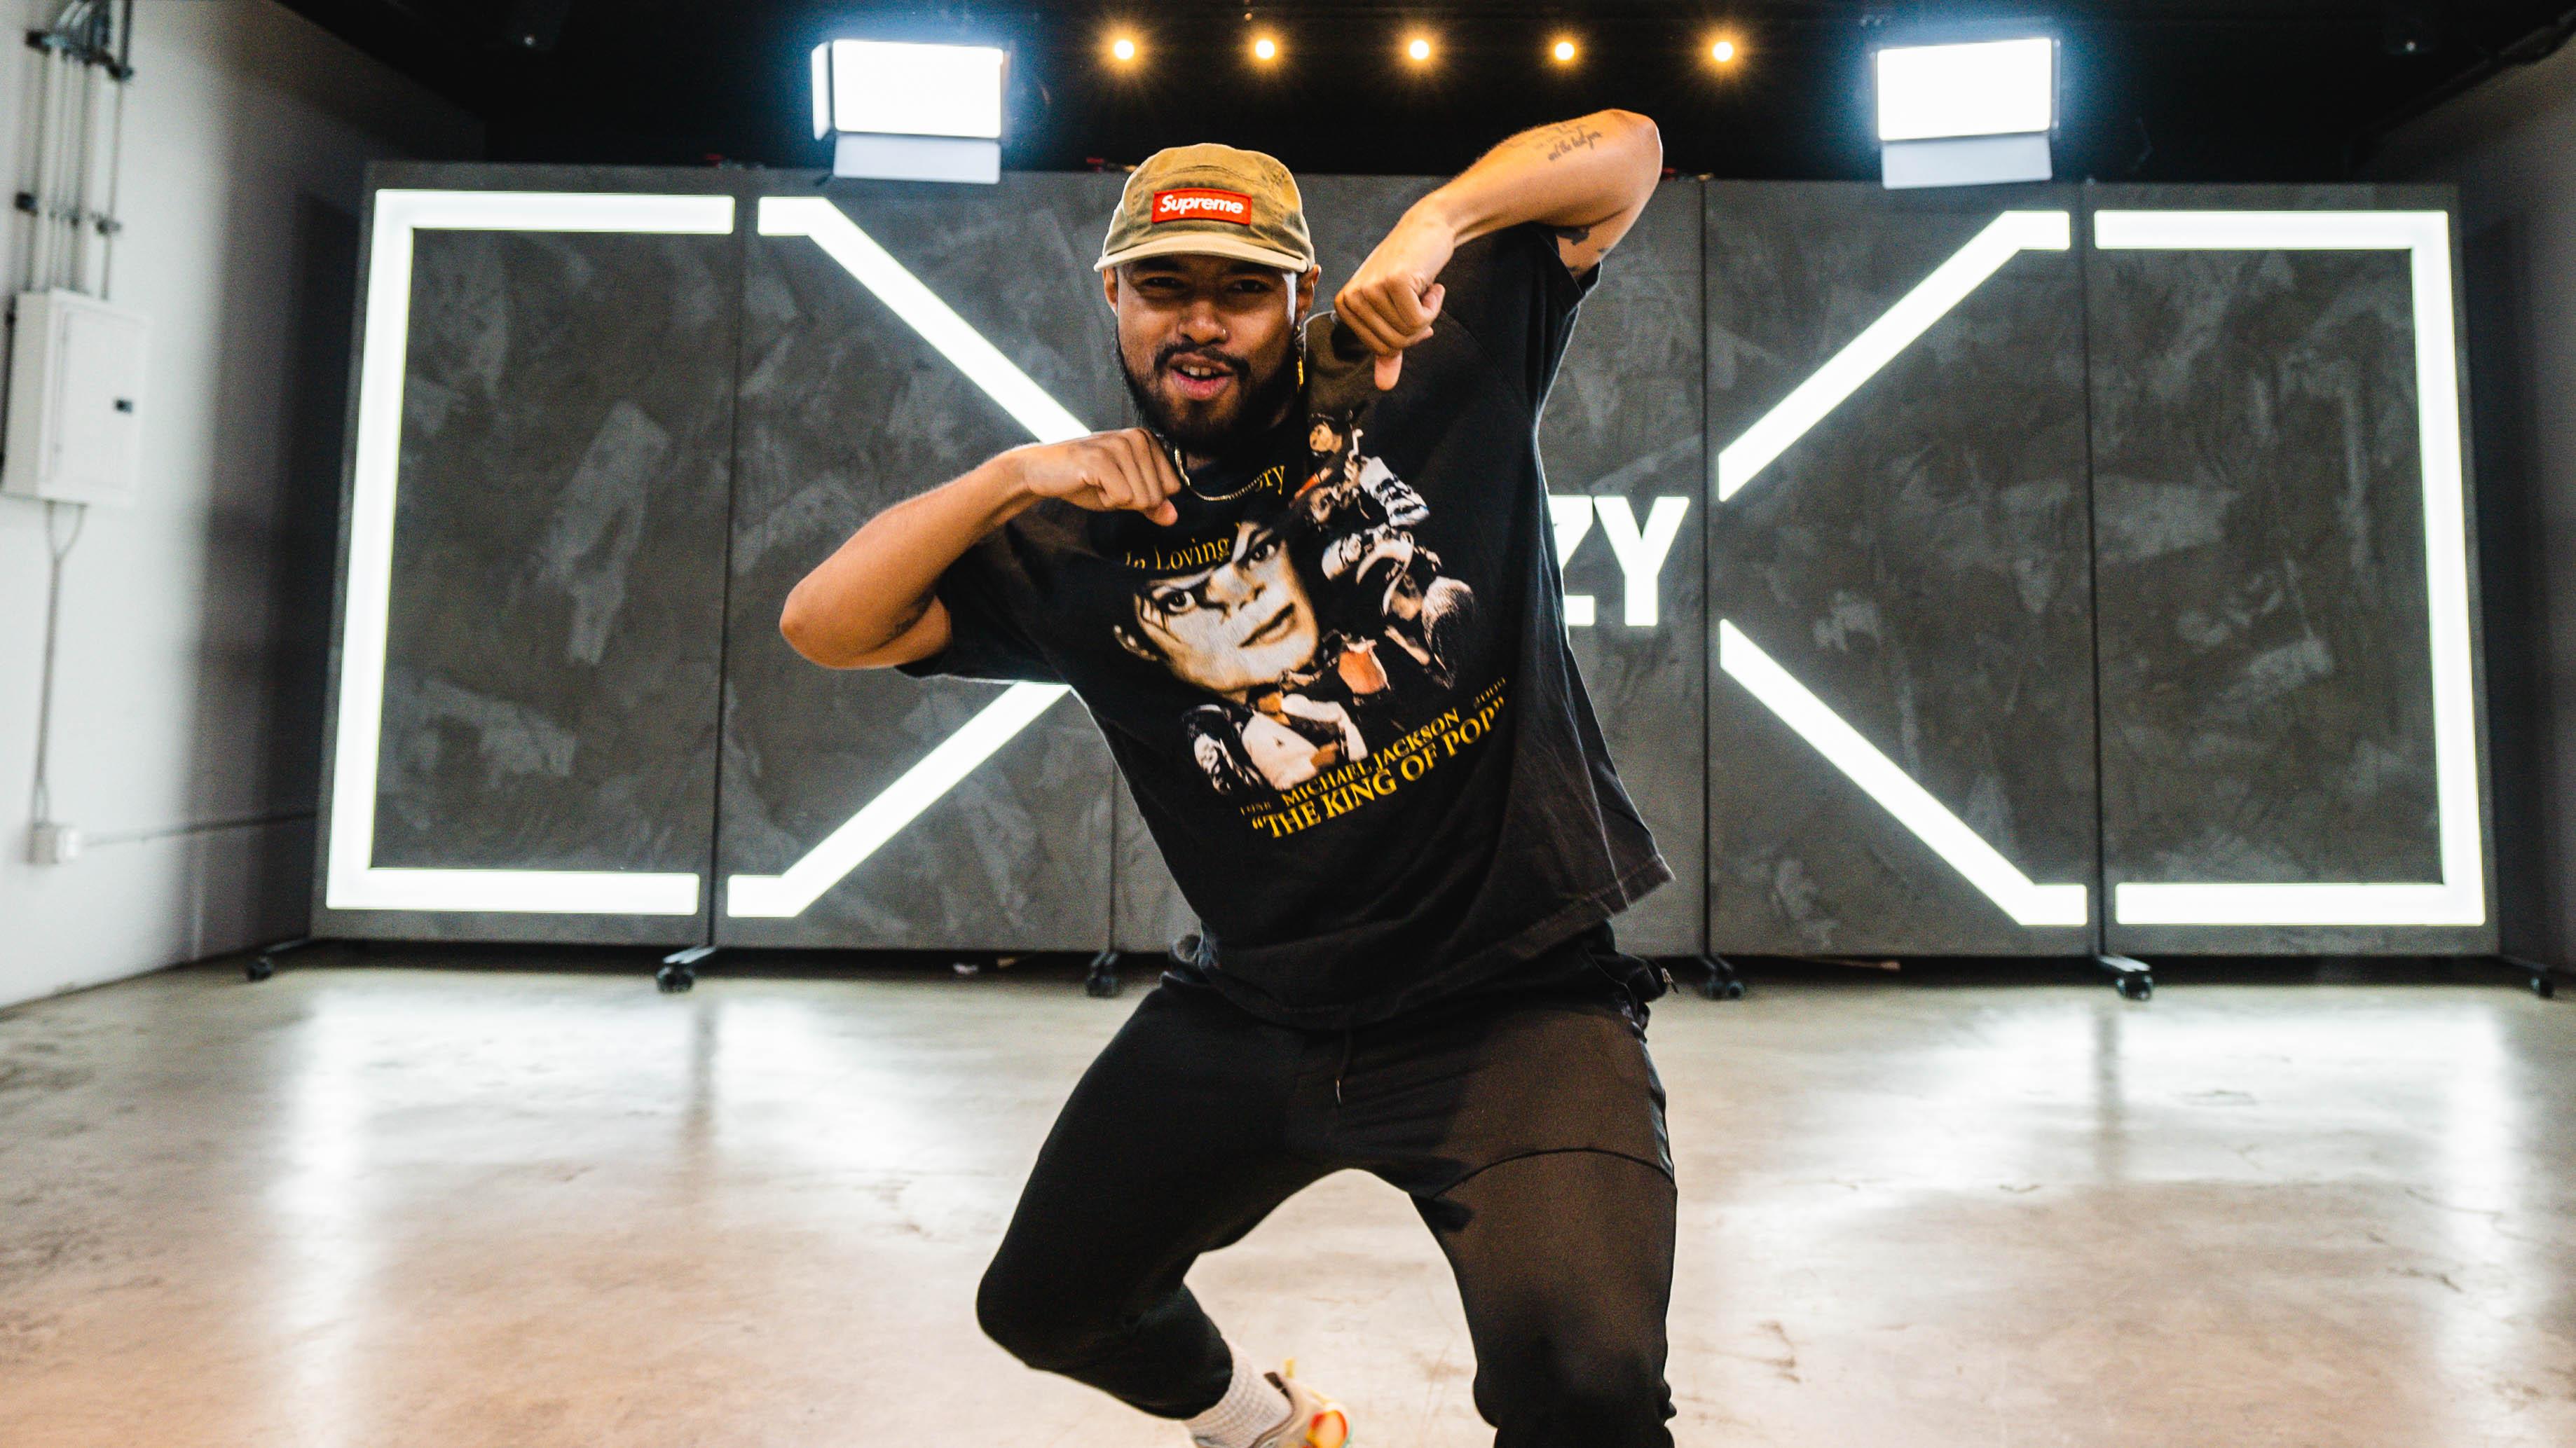 brandon beastboi doing the jerk dance move